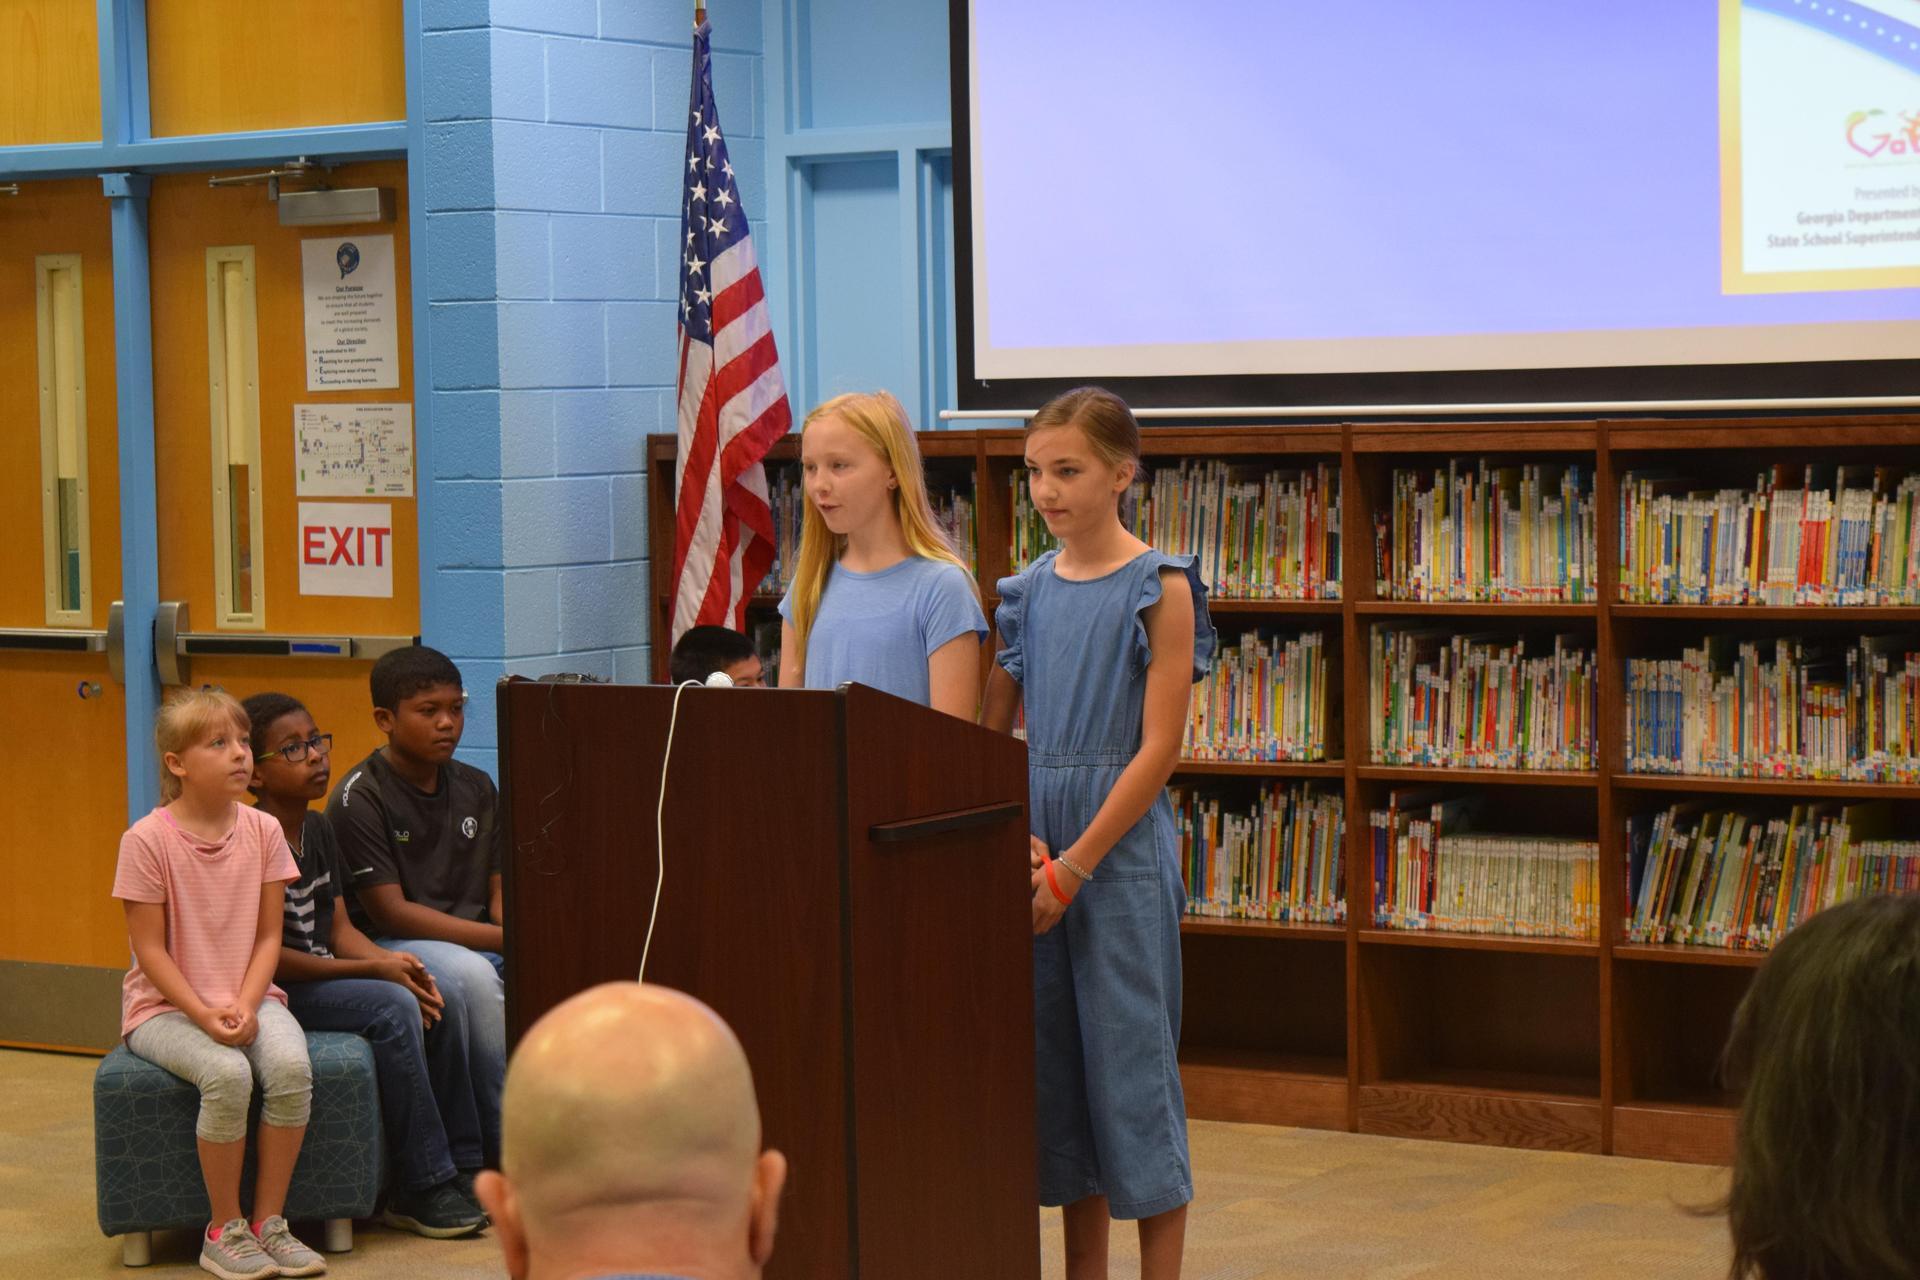 students presenting at podium